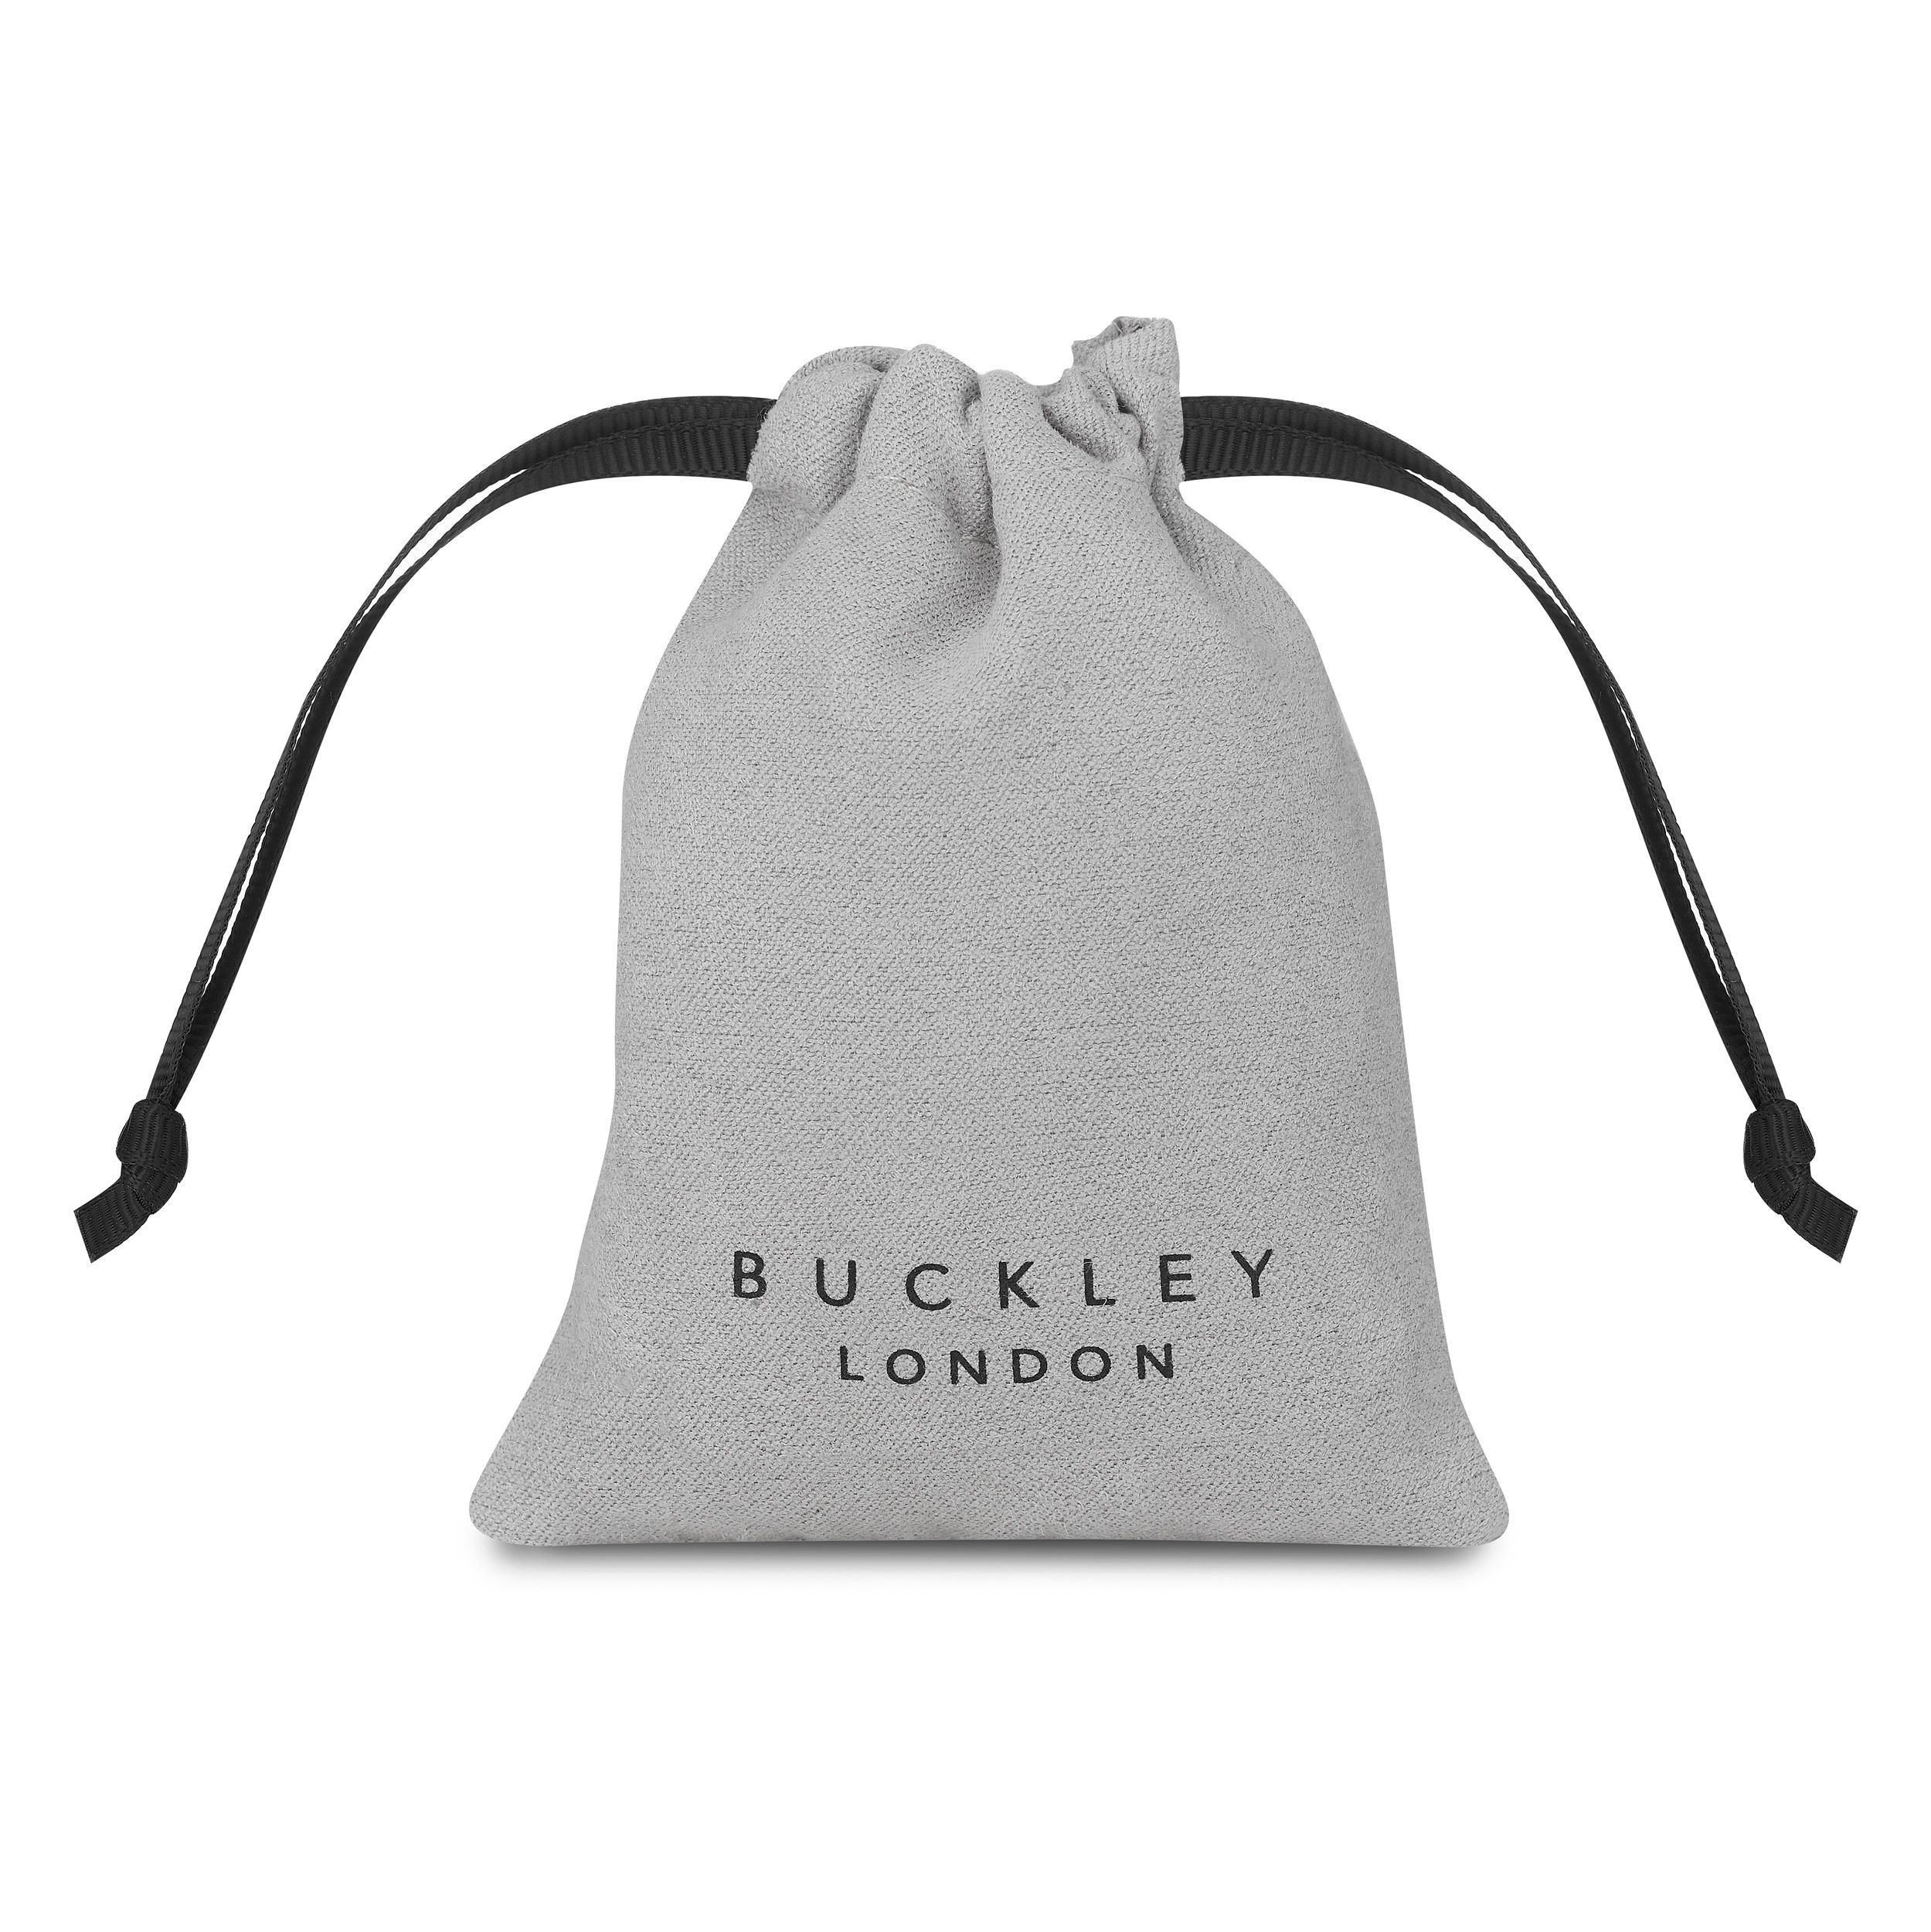 Buckley London Foy Bracelet - Rainbow Bag